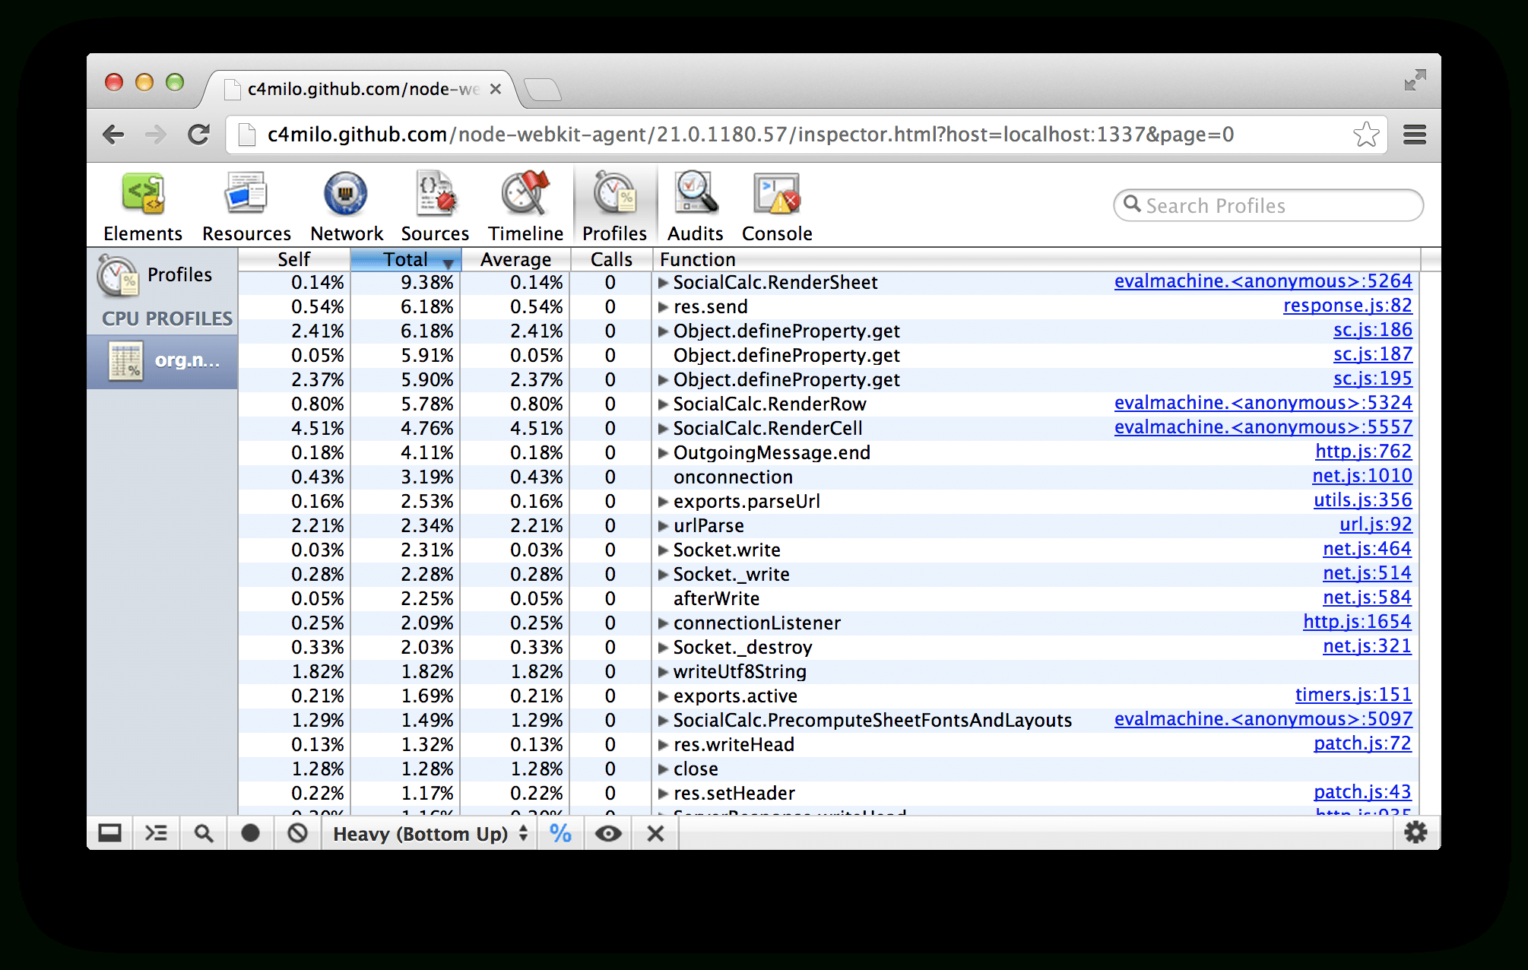 Javascript Spreadsheet Editor With Ethercalc